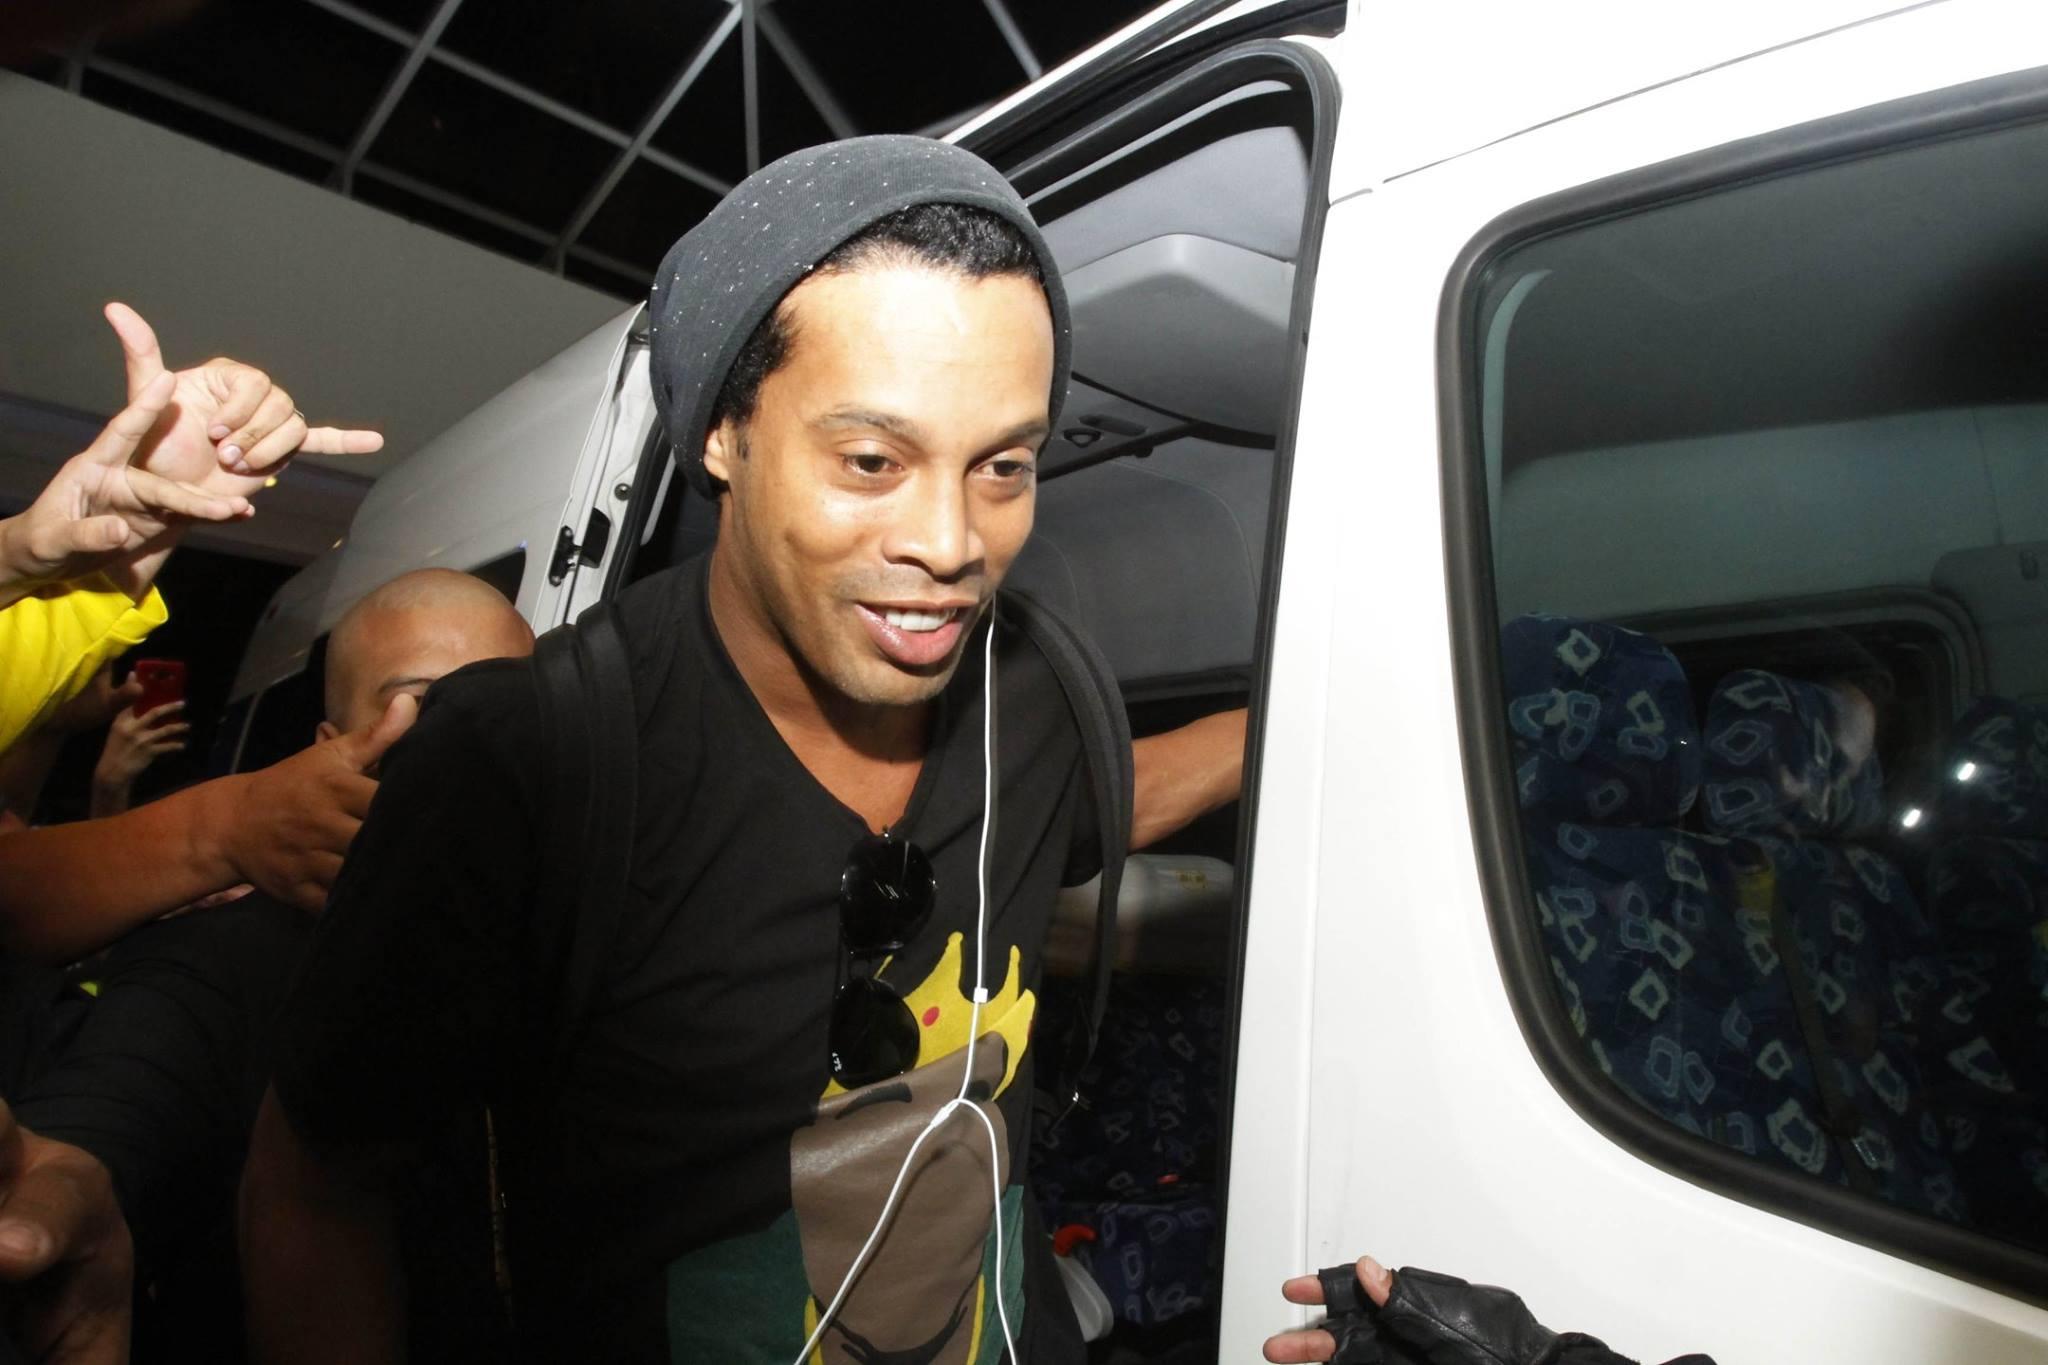 Ronaldinho con prisión preventiva en Hotel céntrico de Asunción